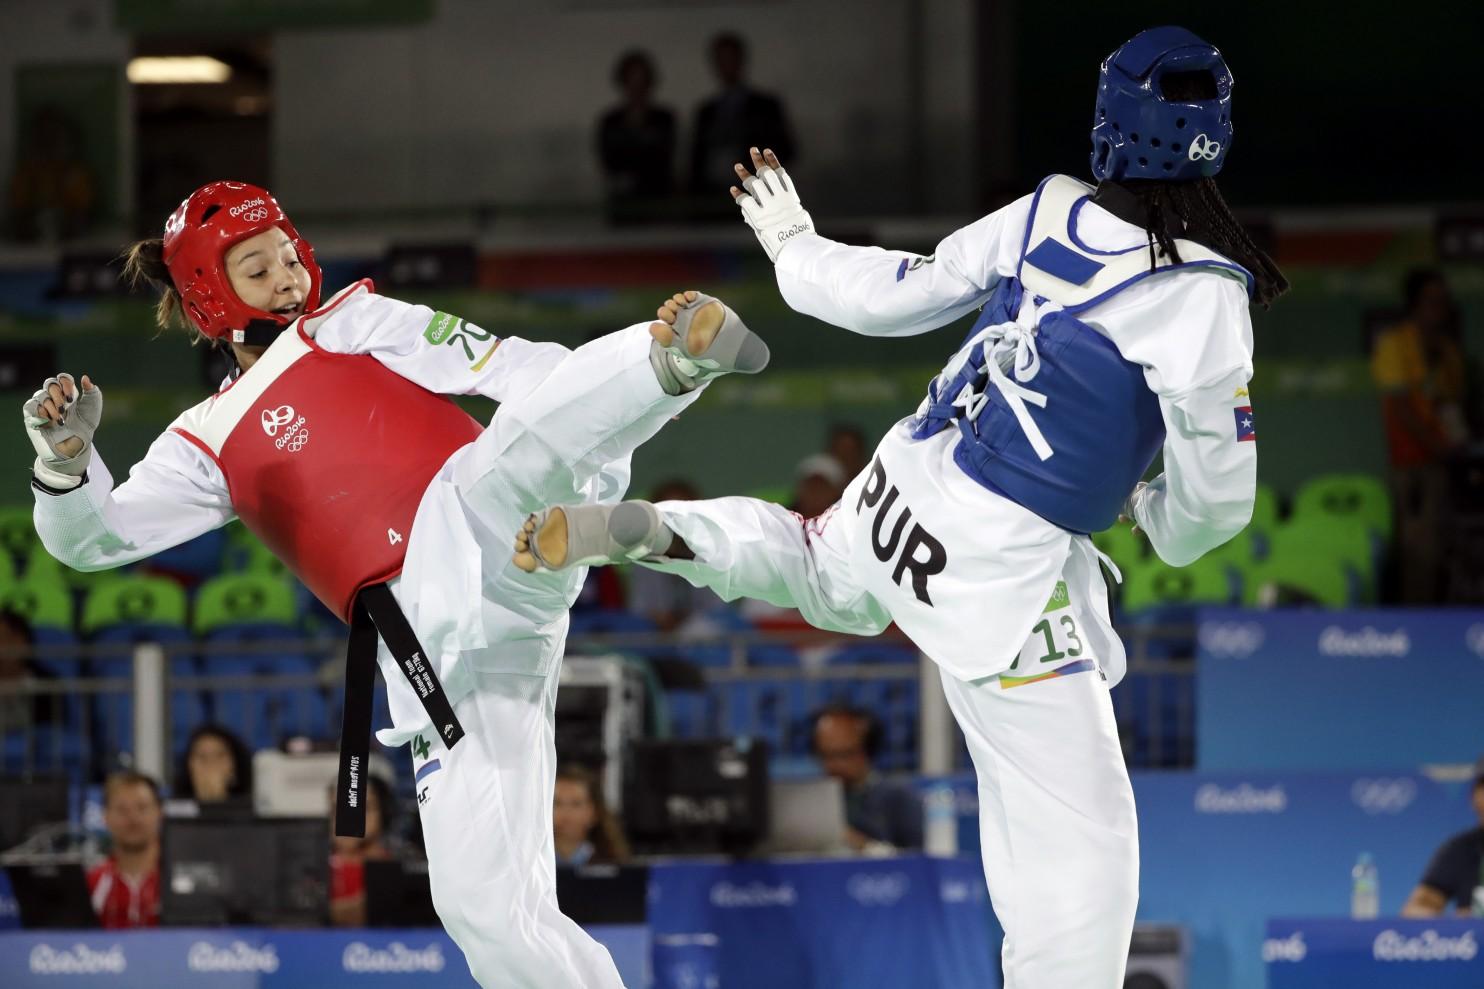 Illustration : Rio Olympics Taekwondo Women - WashPost